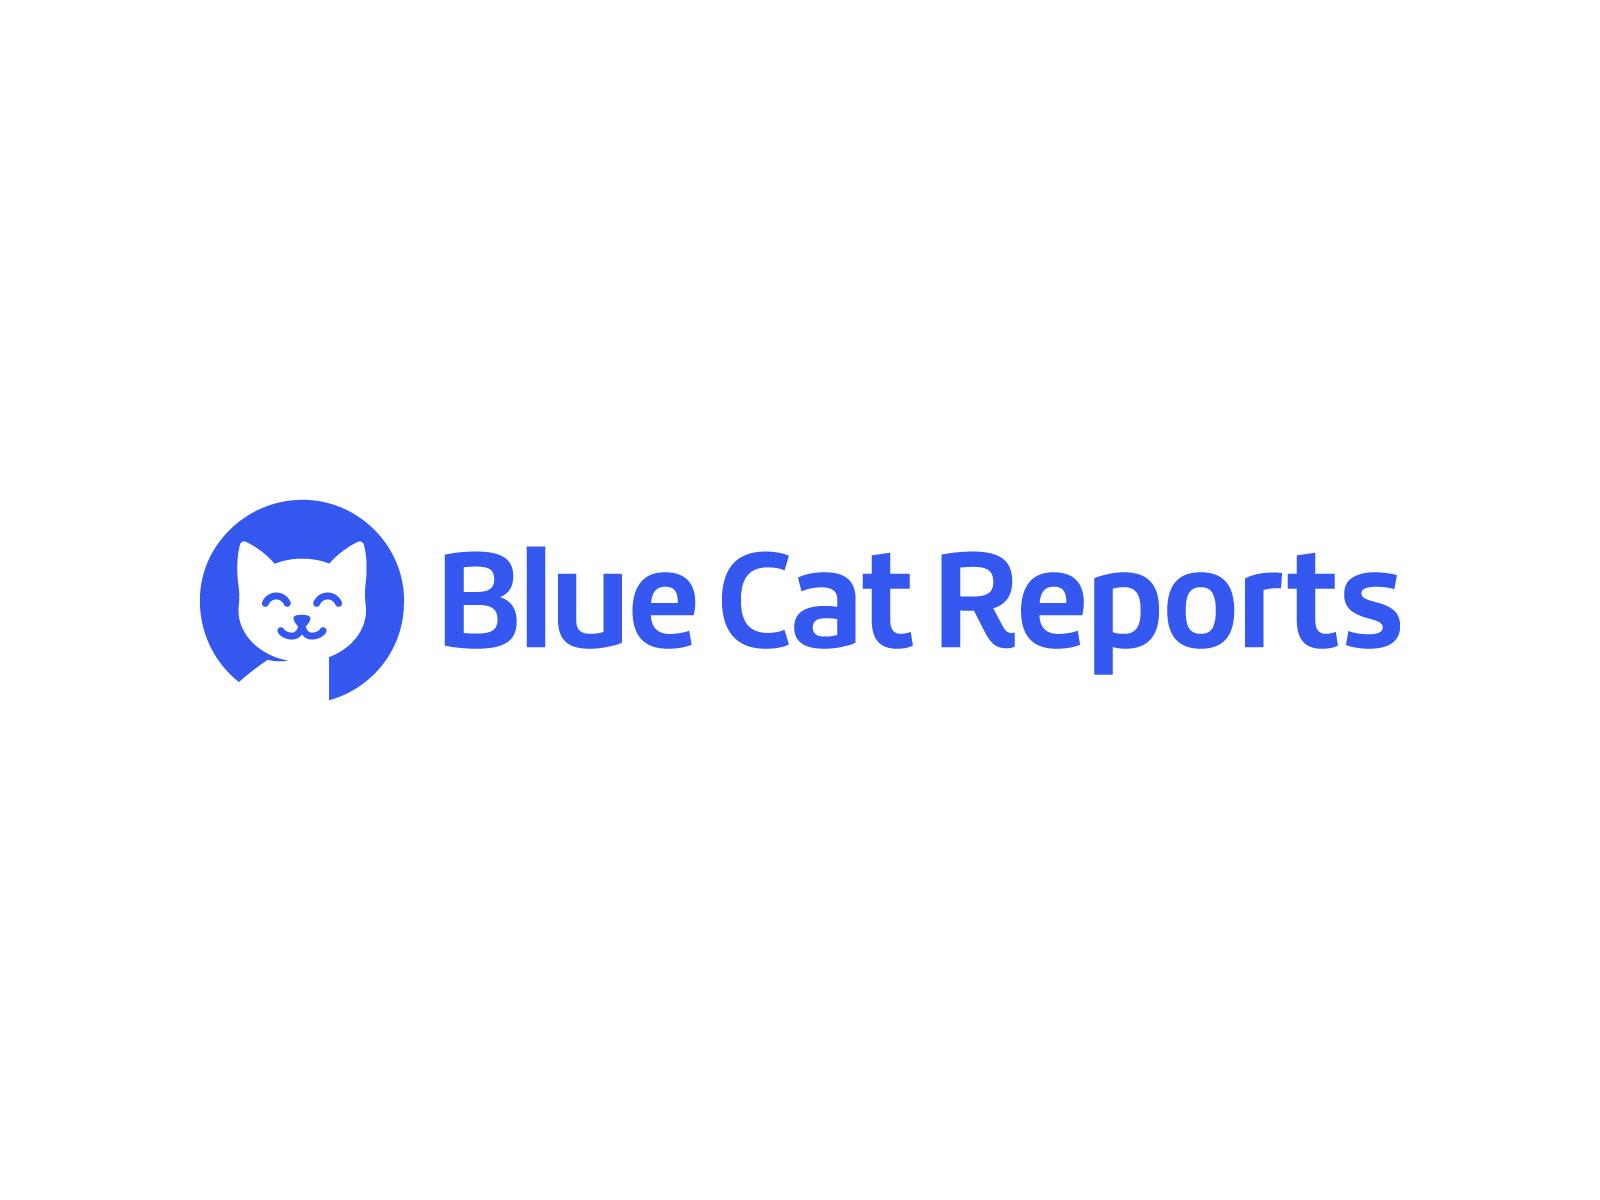 Blue Cat Reports – Logo Design